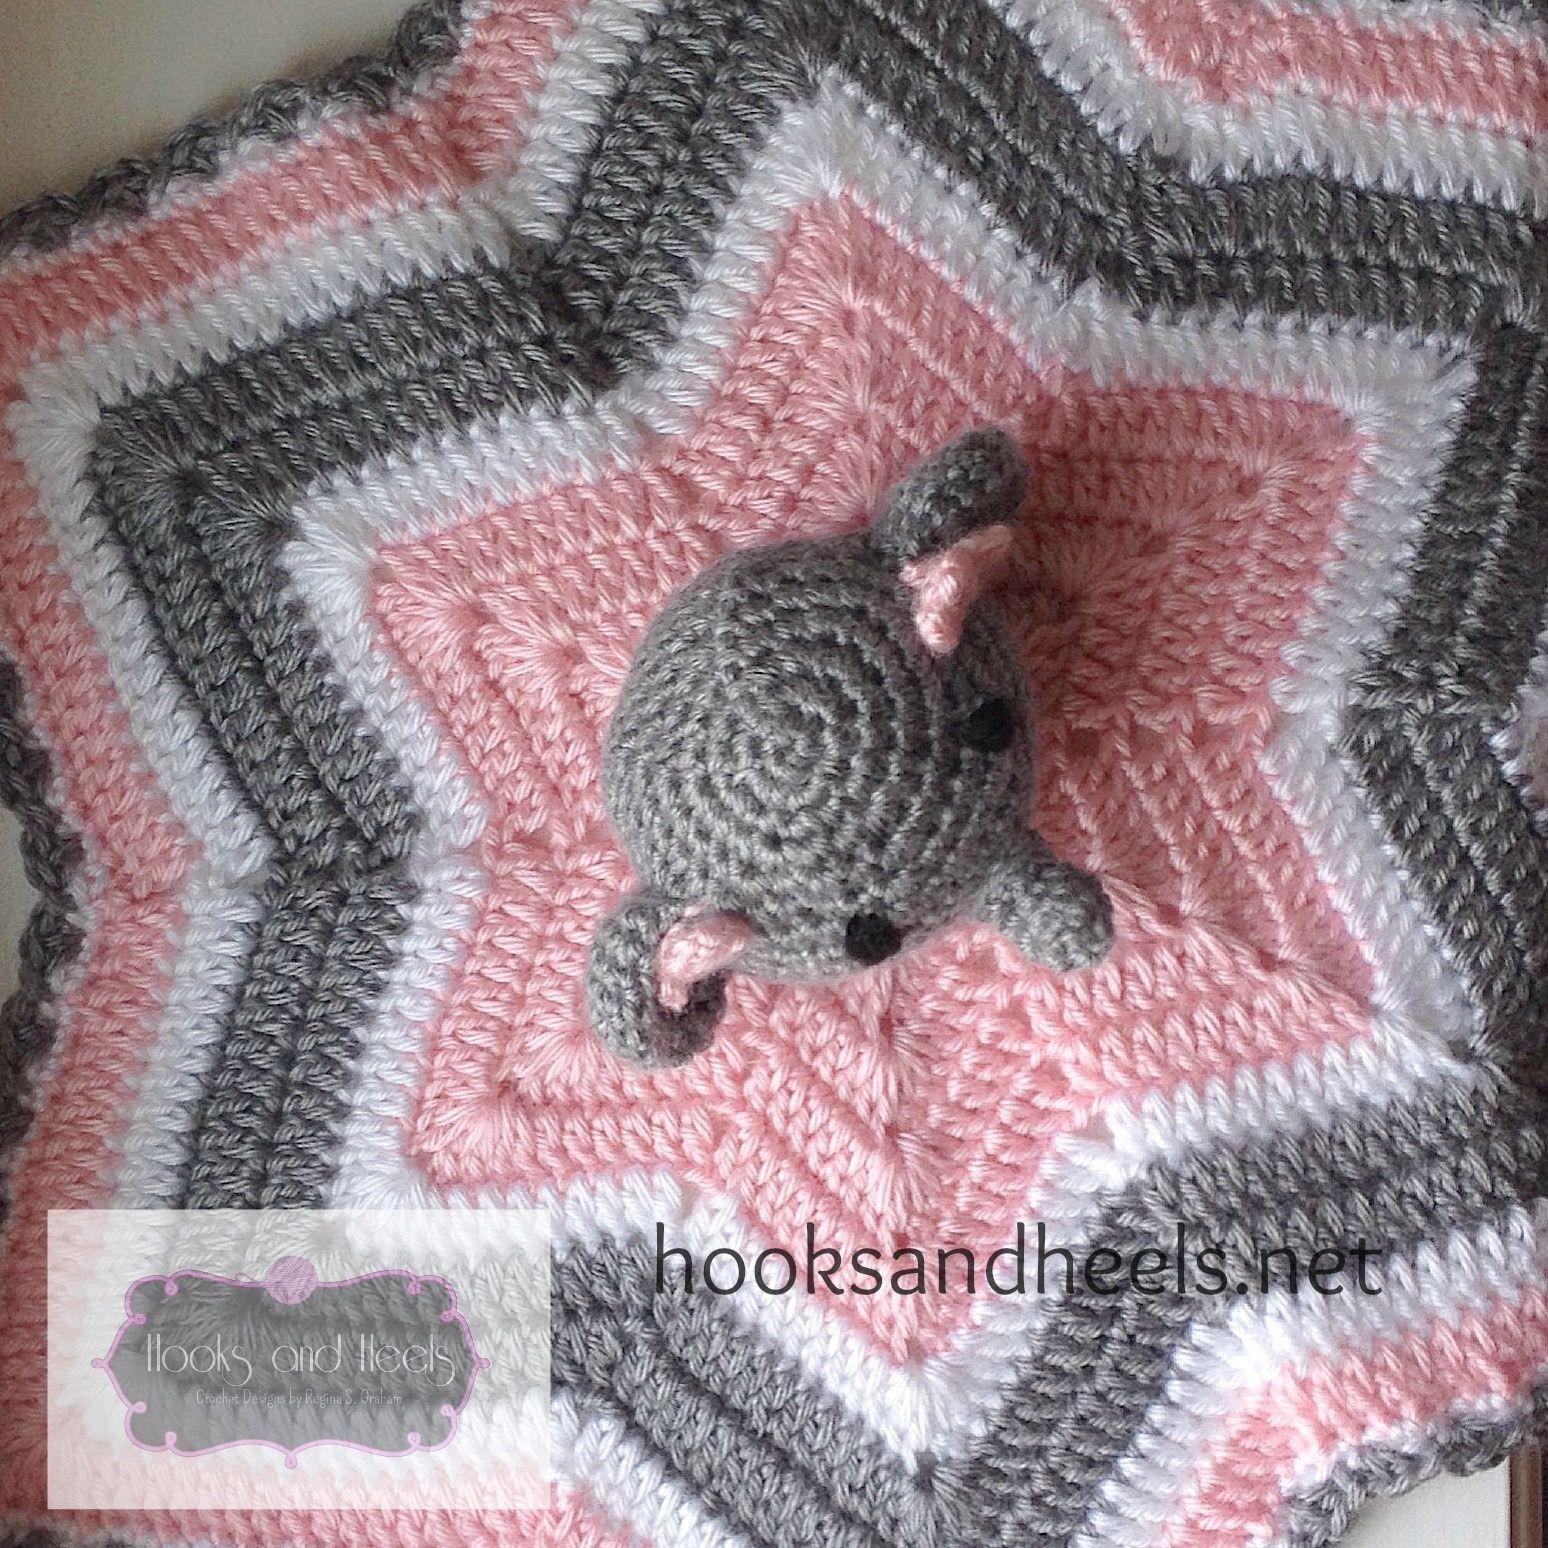 Amigurumi Elephant Nina Free Crochet Pattern - Amigurumi Patterns ... | 1548x1548